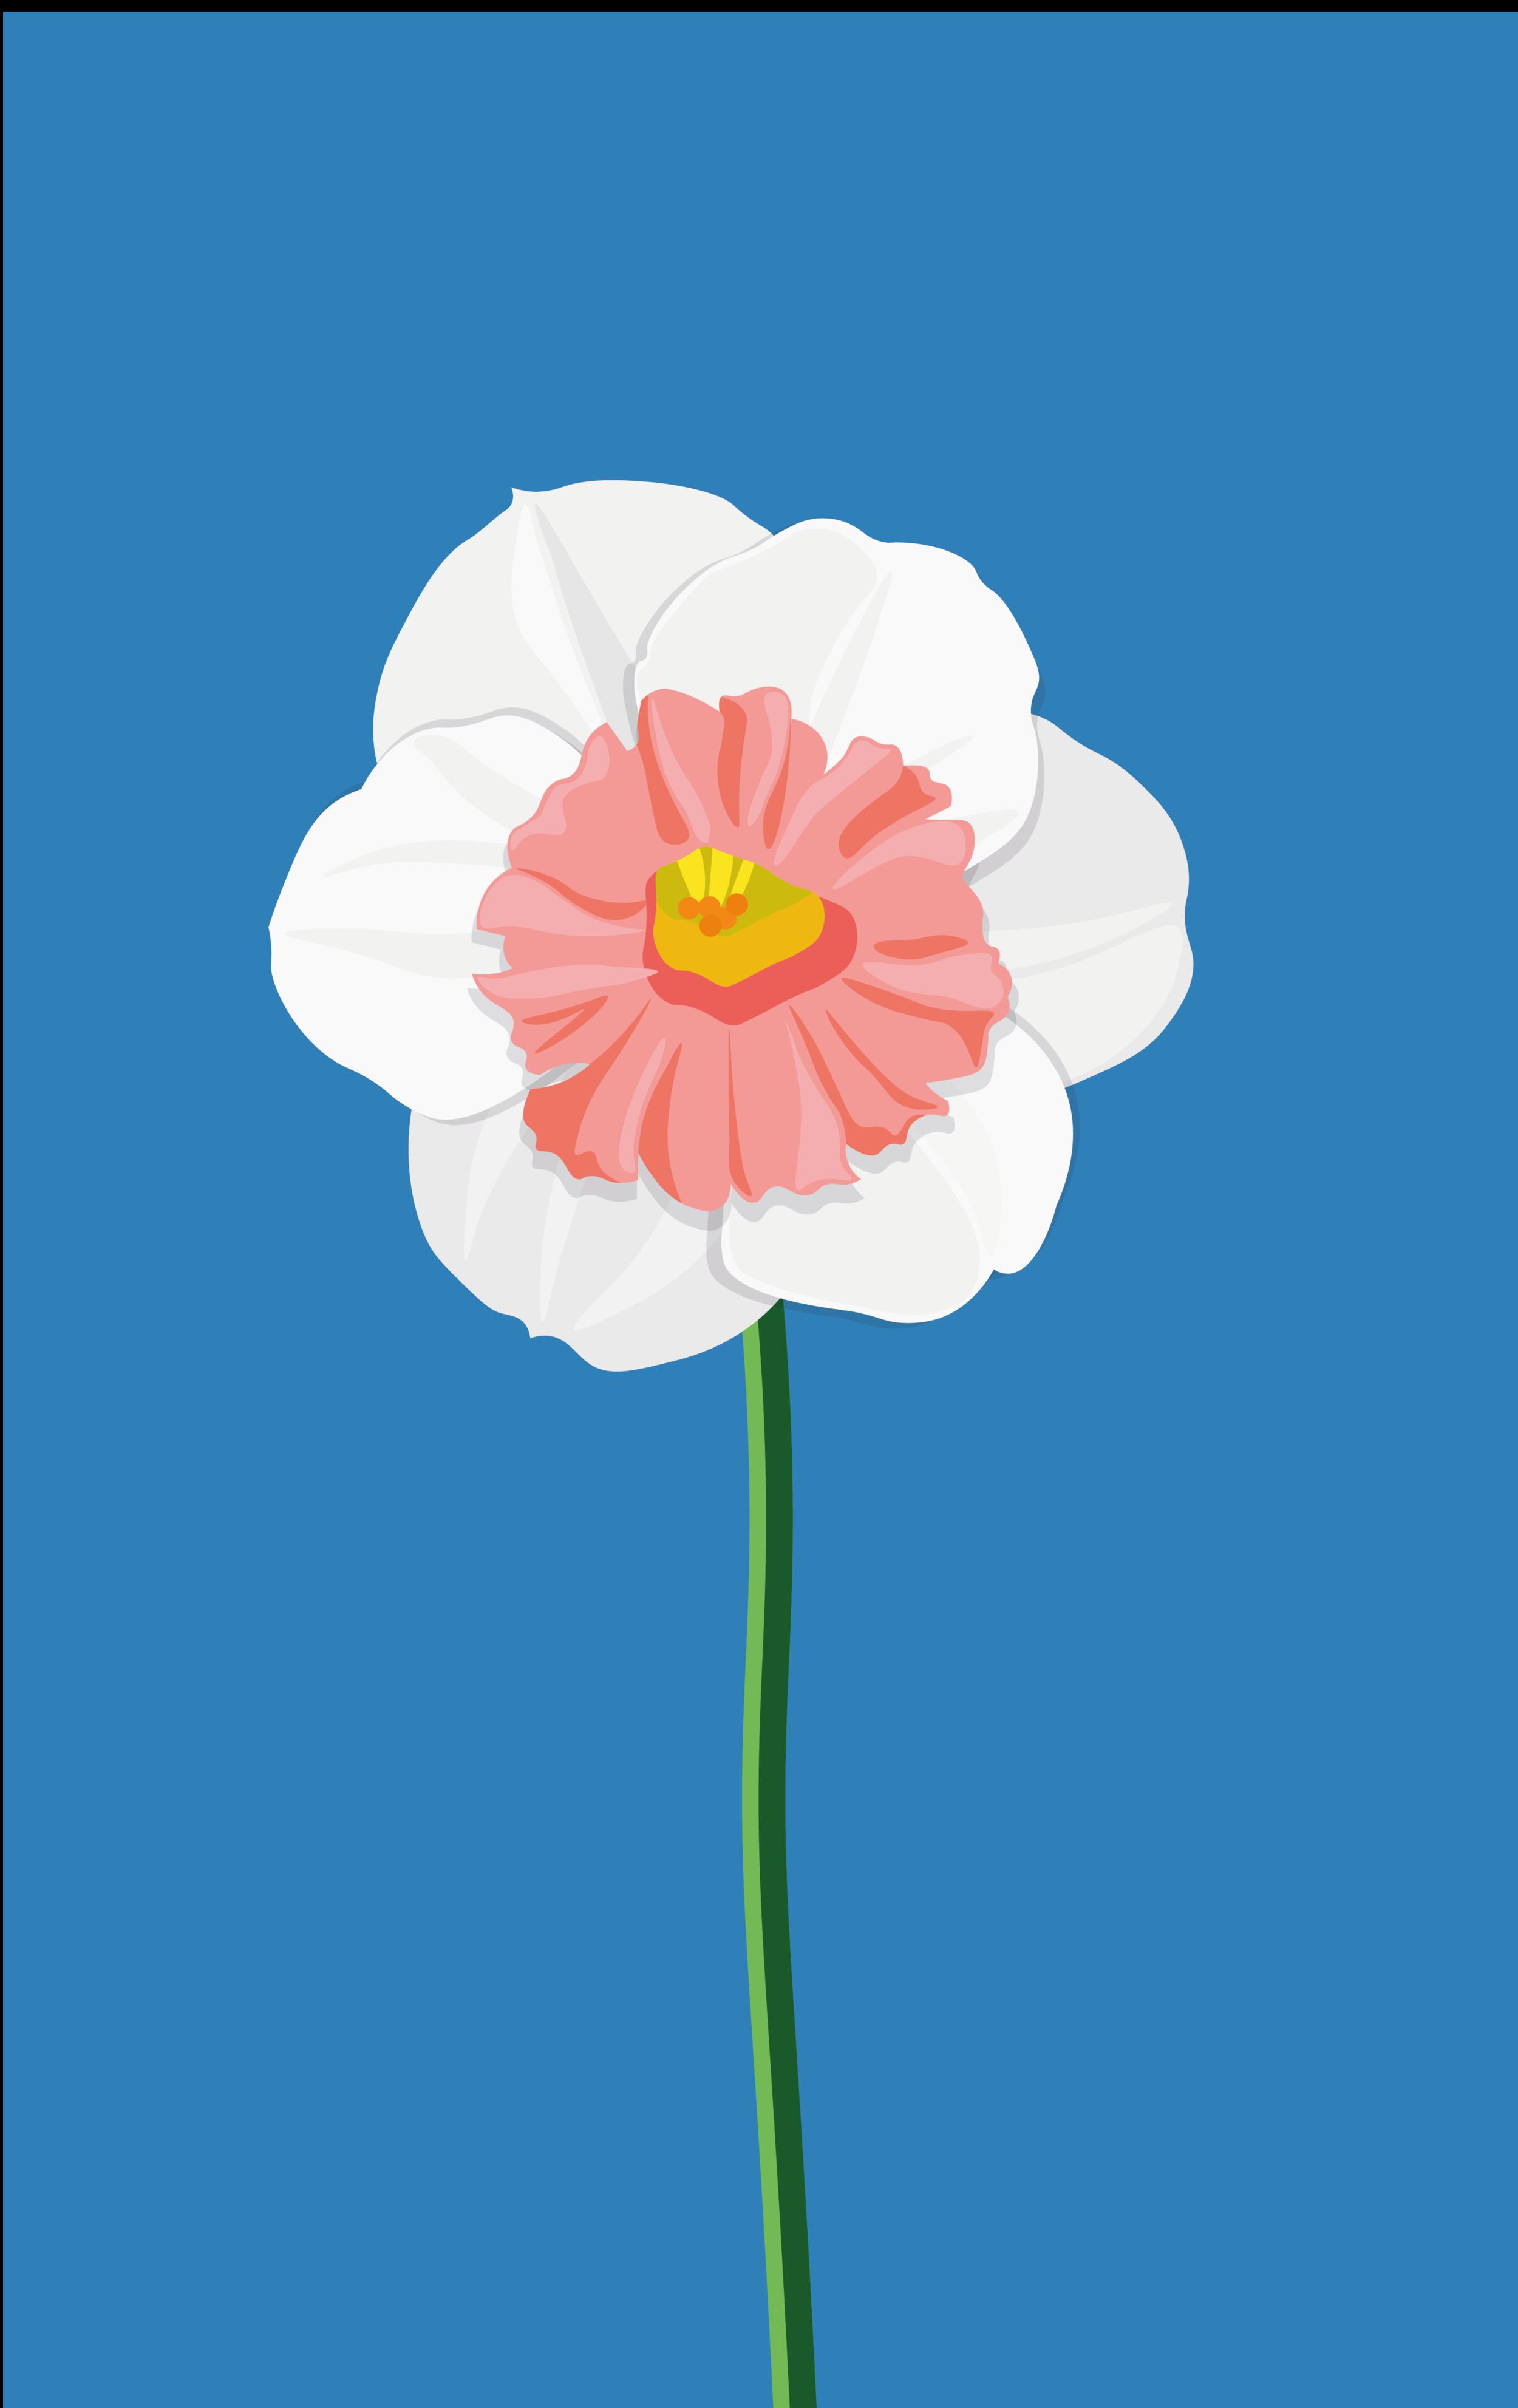 Flower_CARD_Tavola disegno 1 copia 3.png